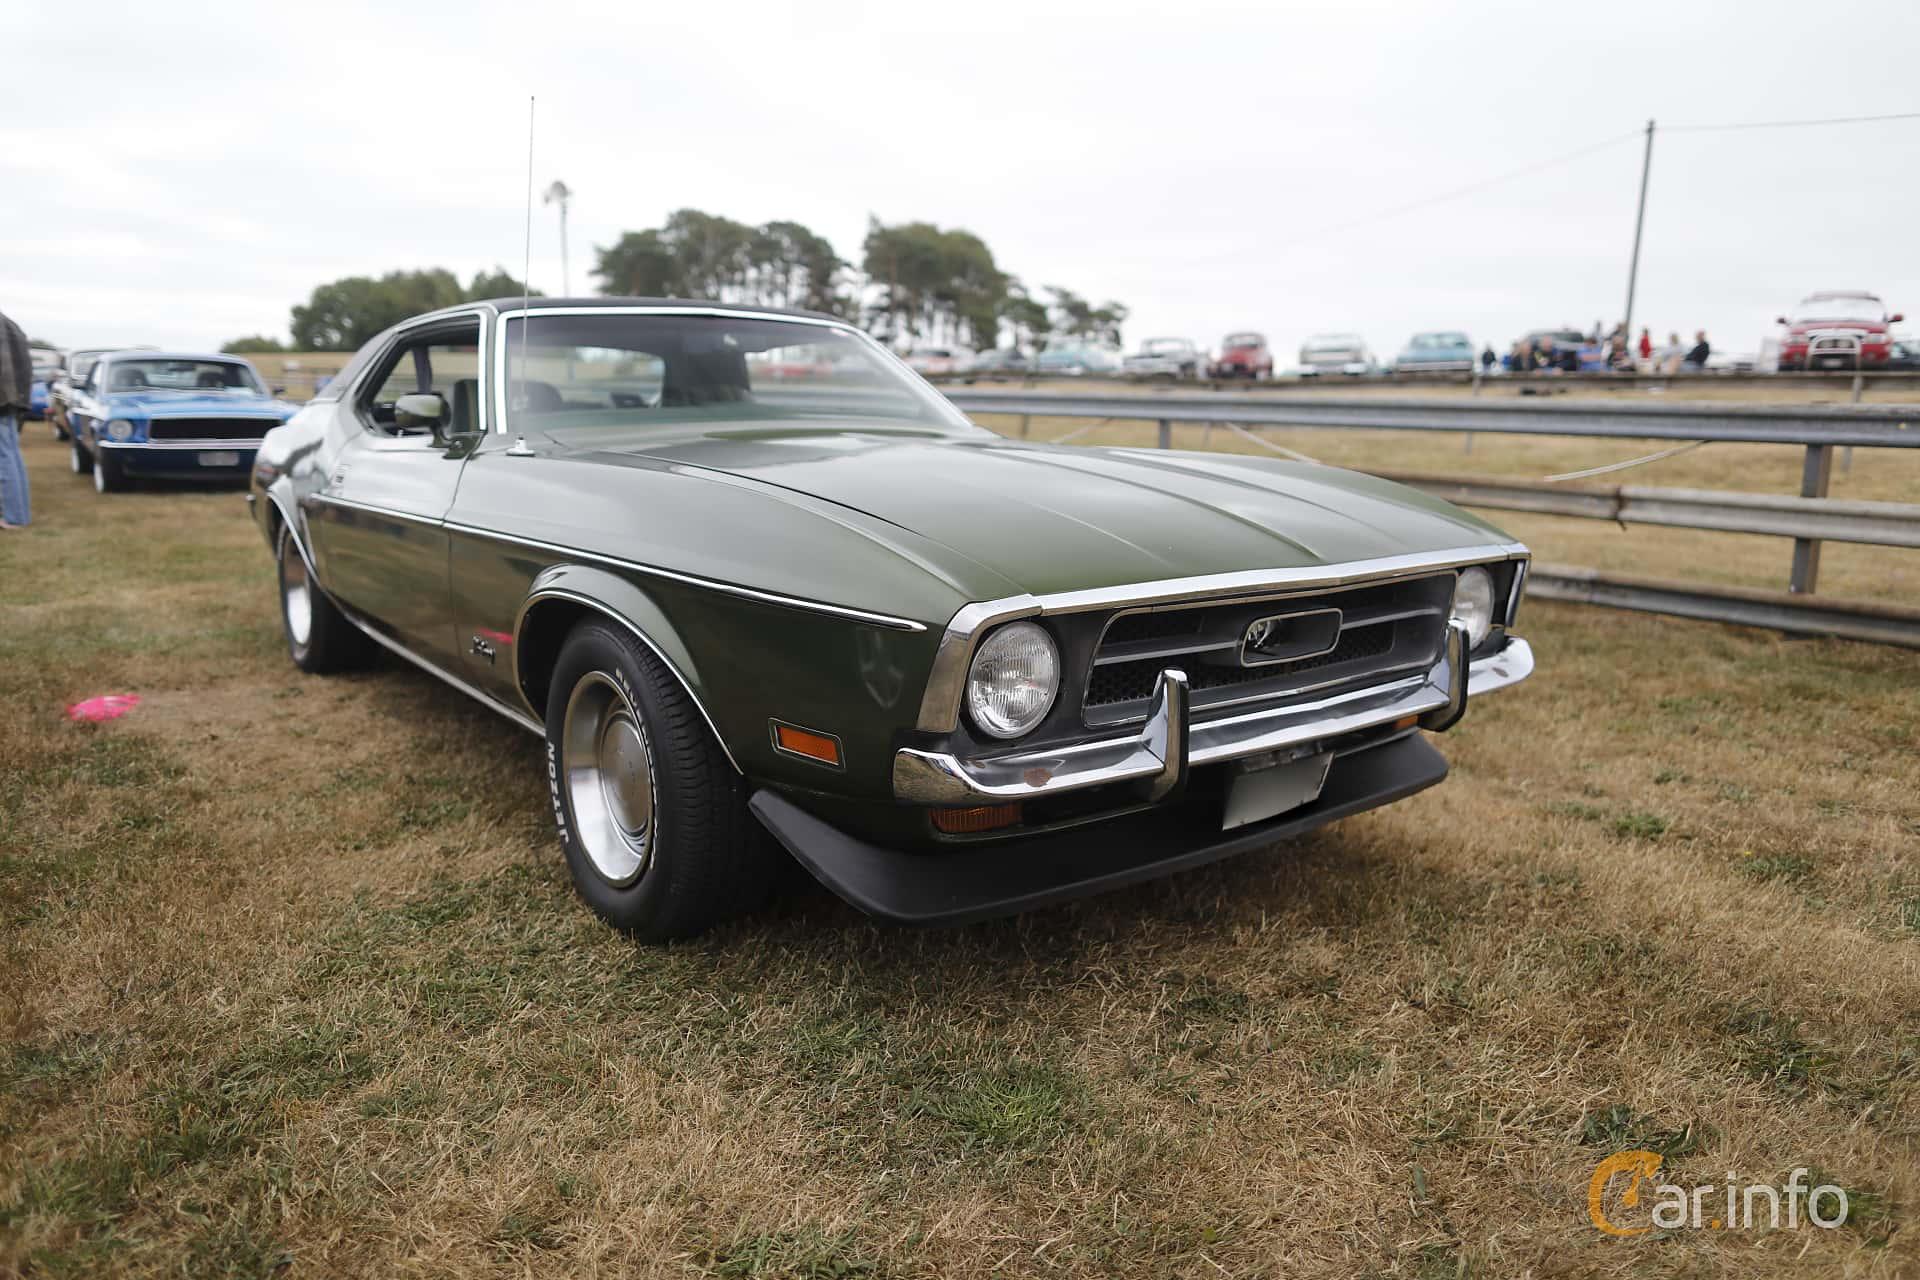 Front side of ford mustang hardtop grande 4 9 v8 manual 137ps 1972 at